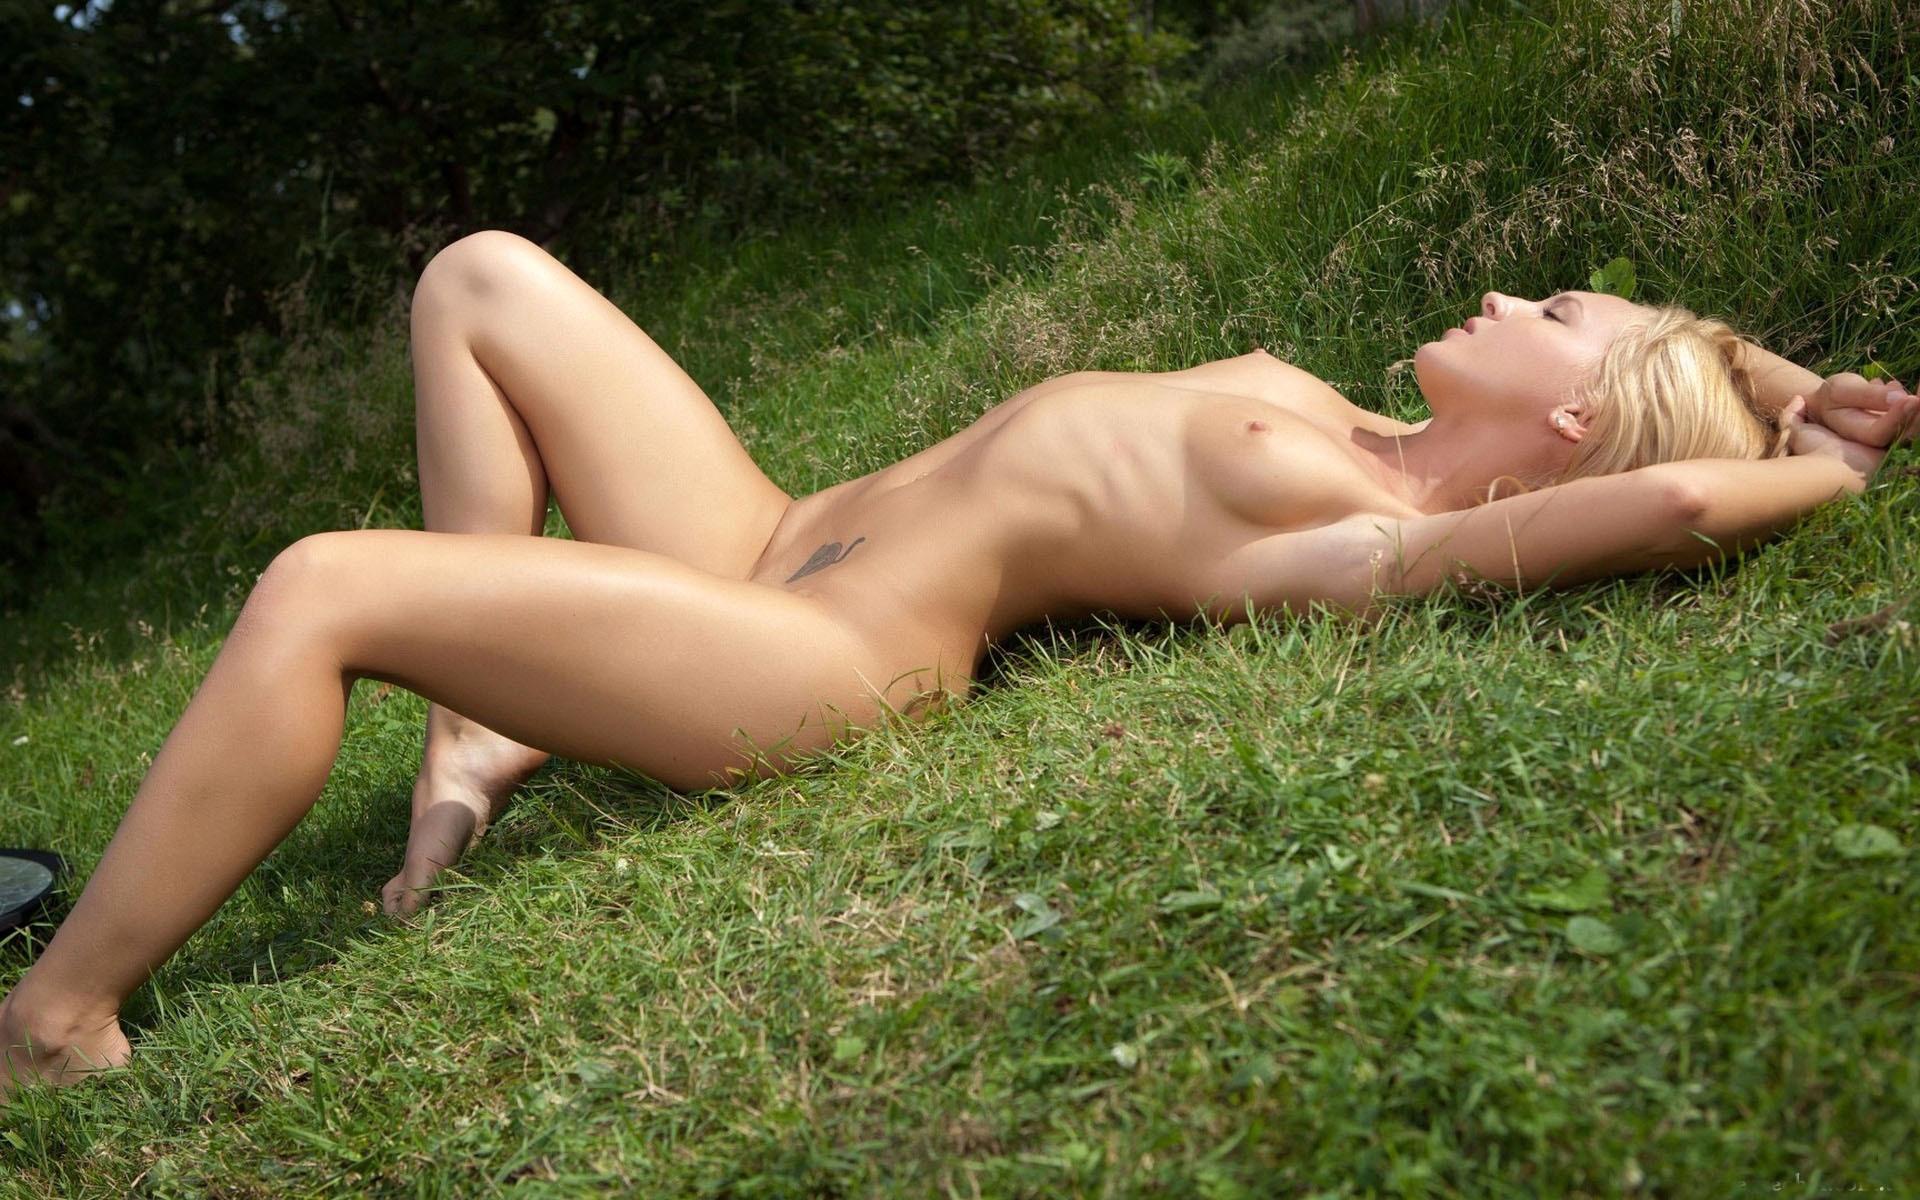 eroticheskoe-foto-na-prirode